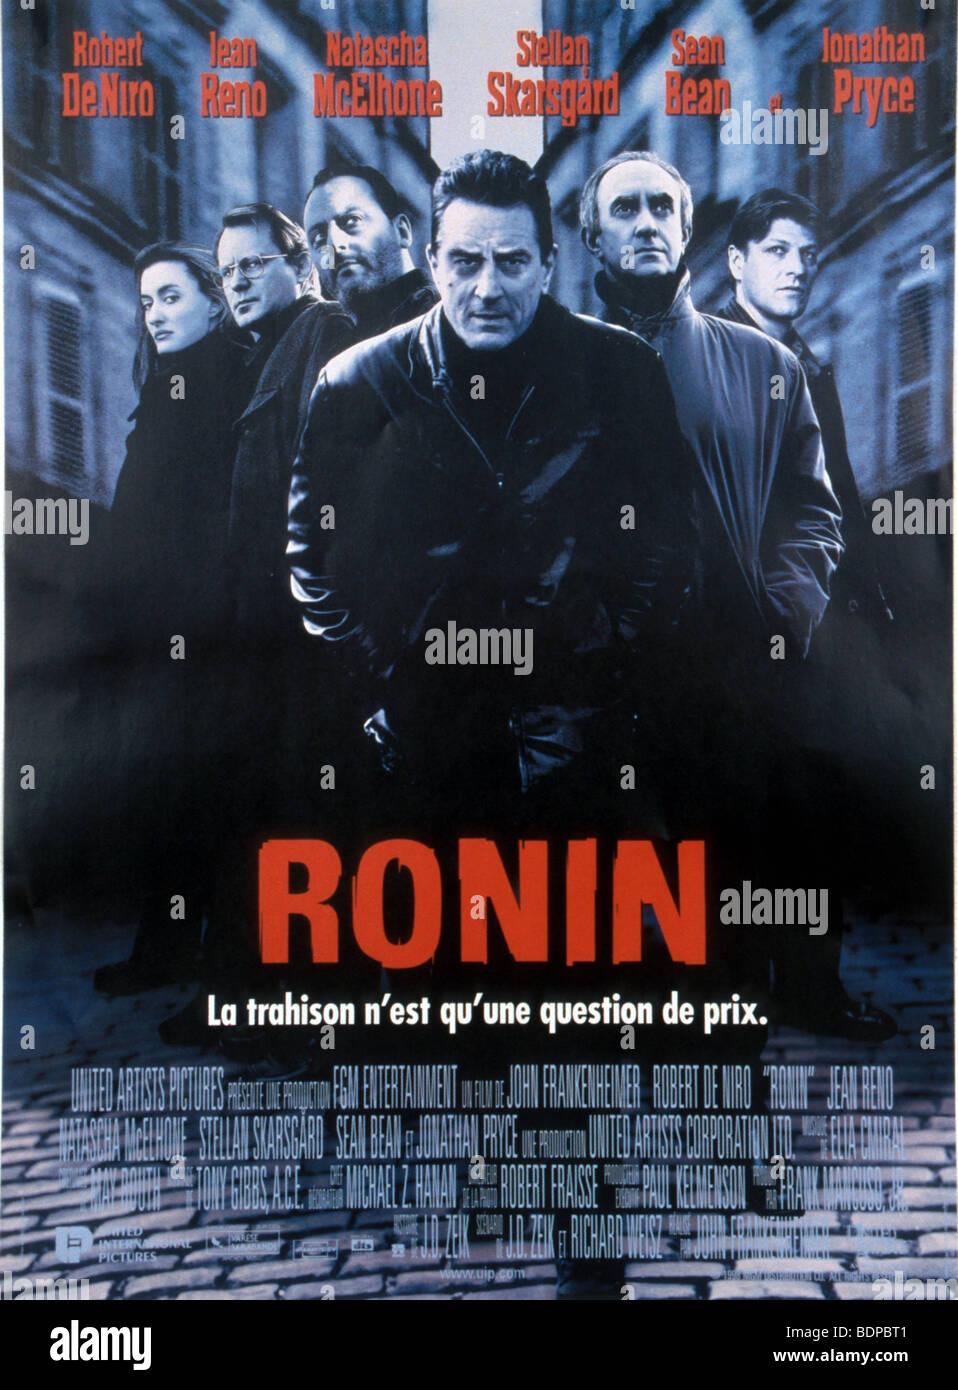 ronin 1998